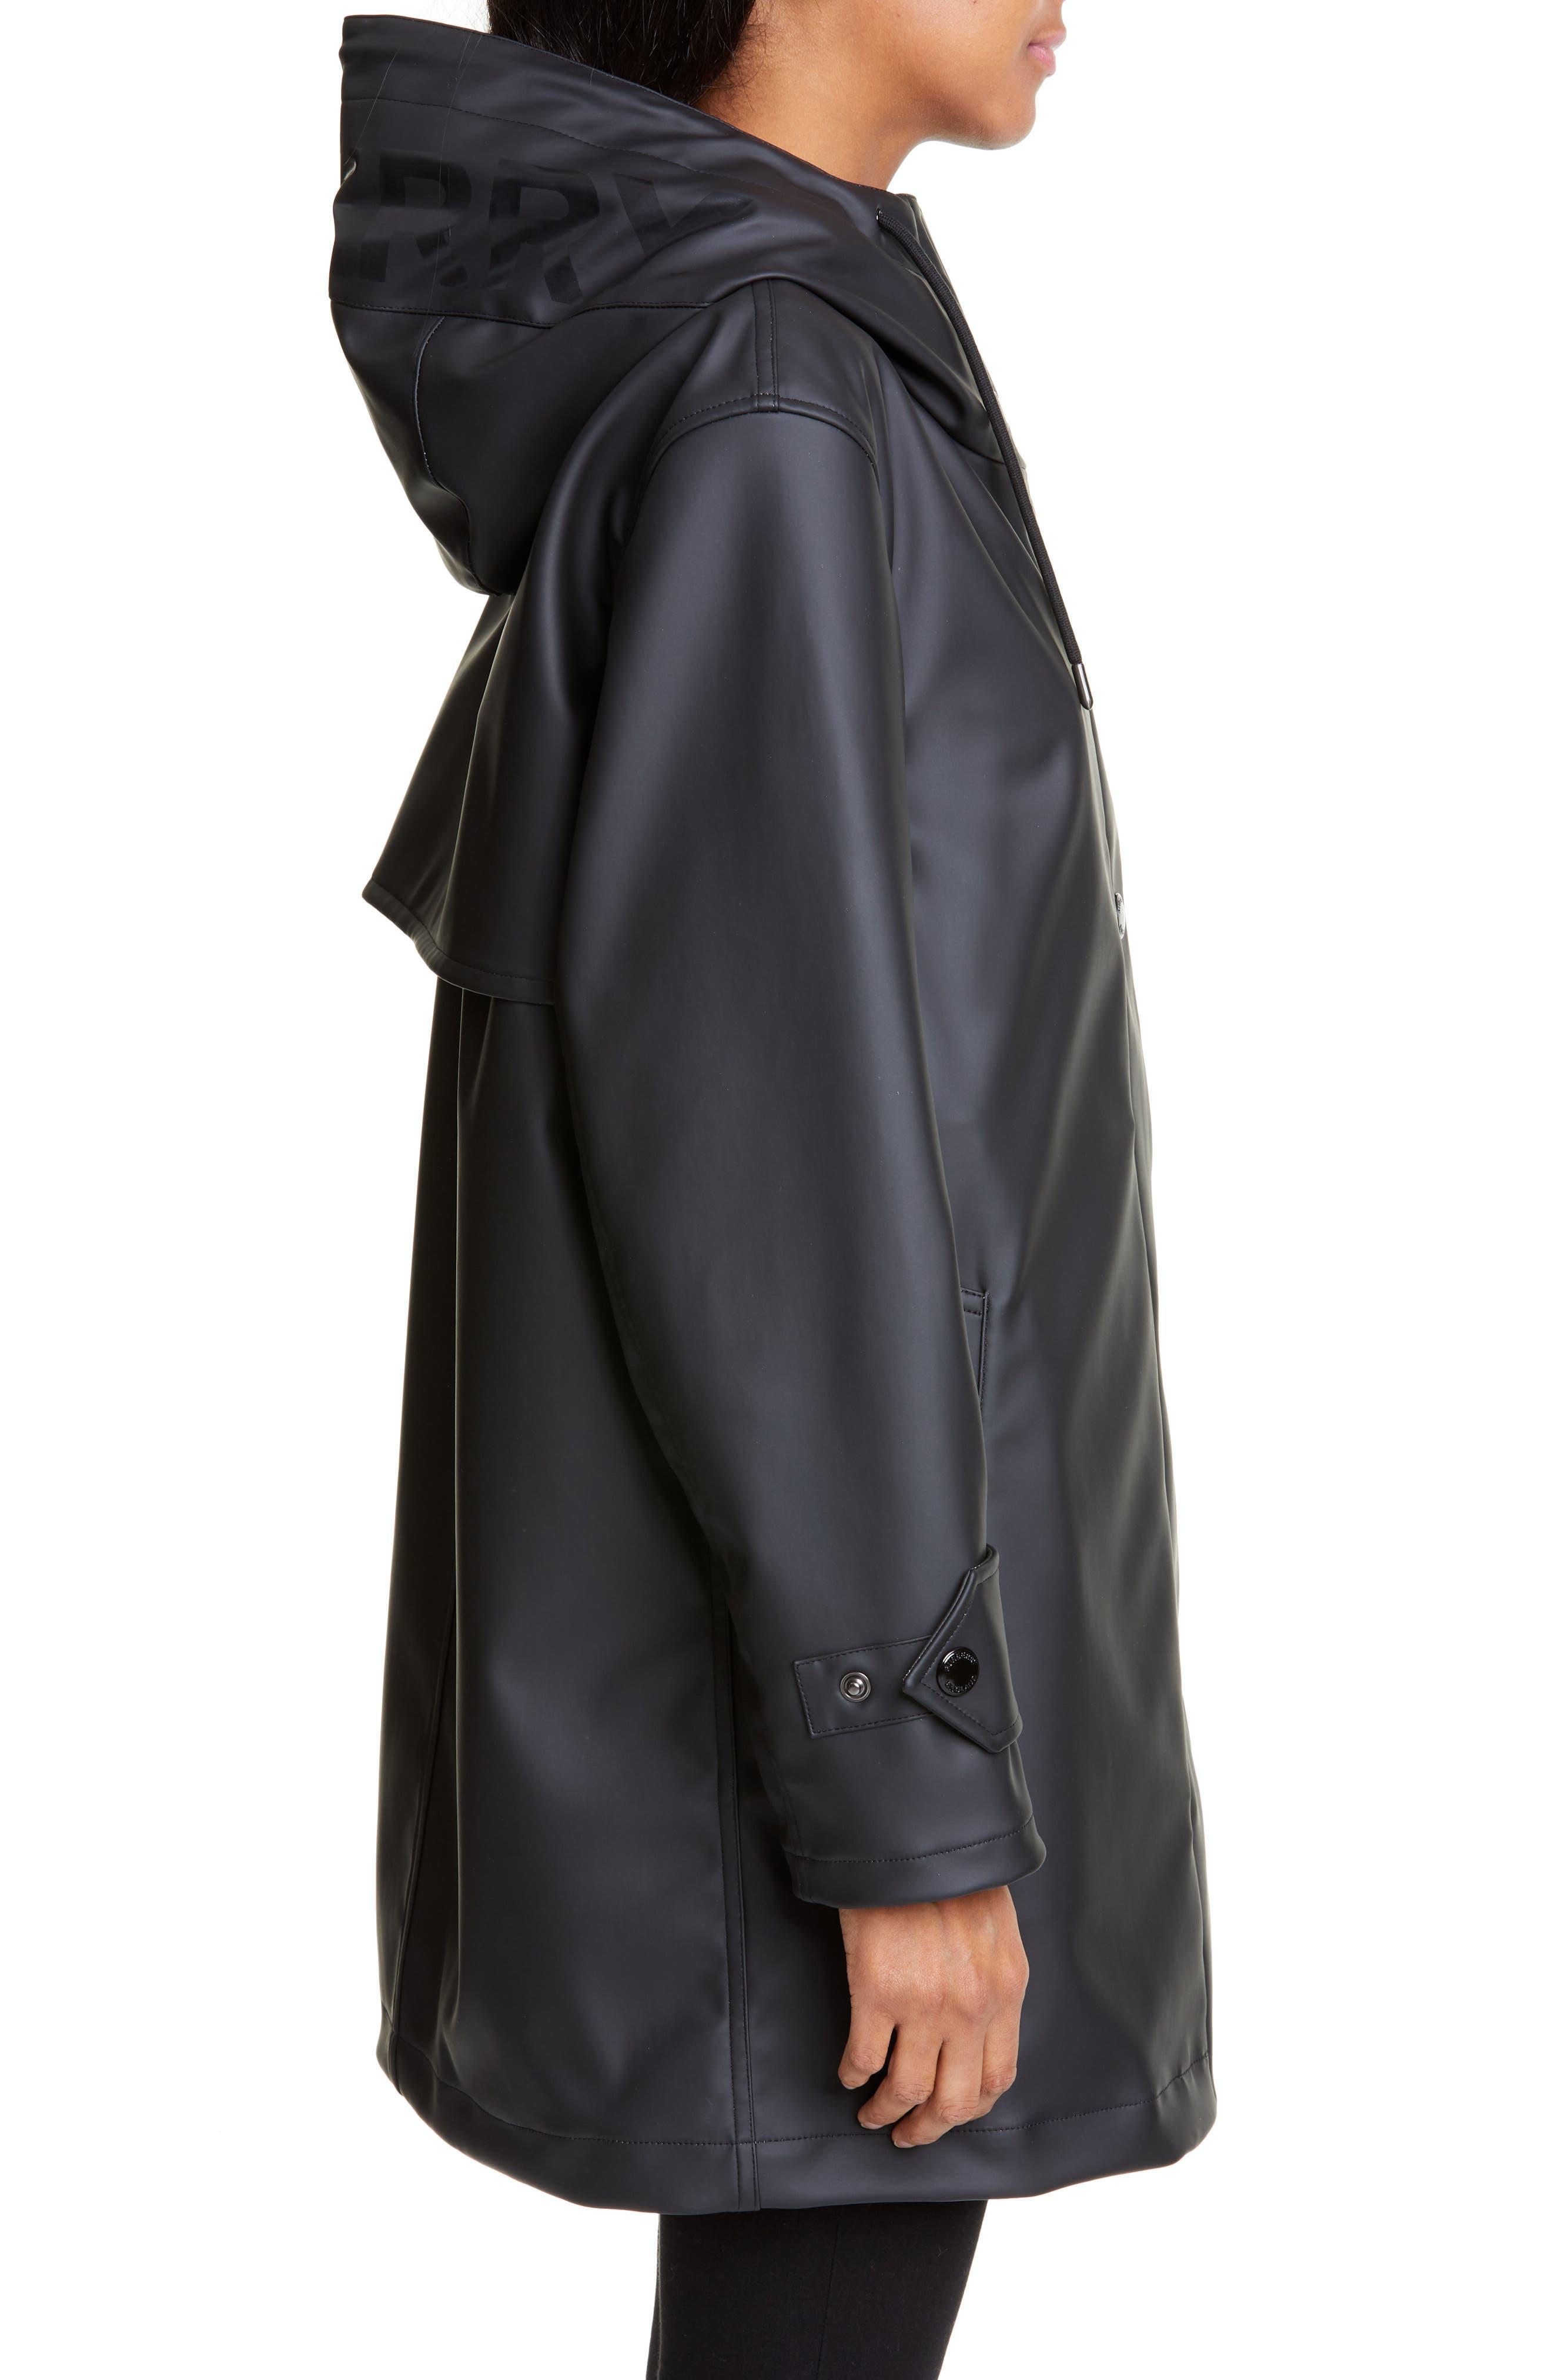 BURBERRY, Hartlebury Coated Rain Coat, Alternate thumbnail 3, color, BLACK / WHITE